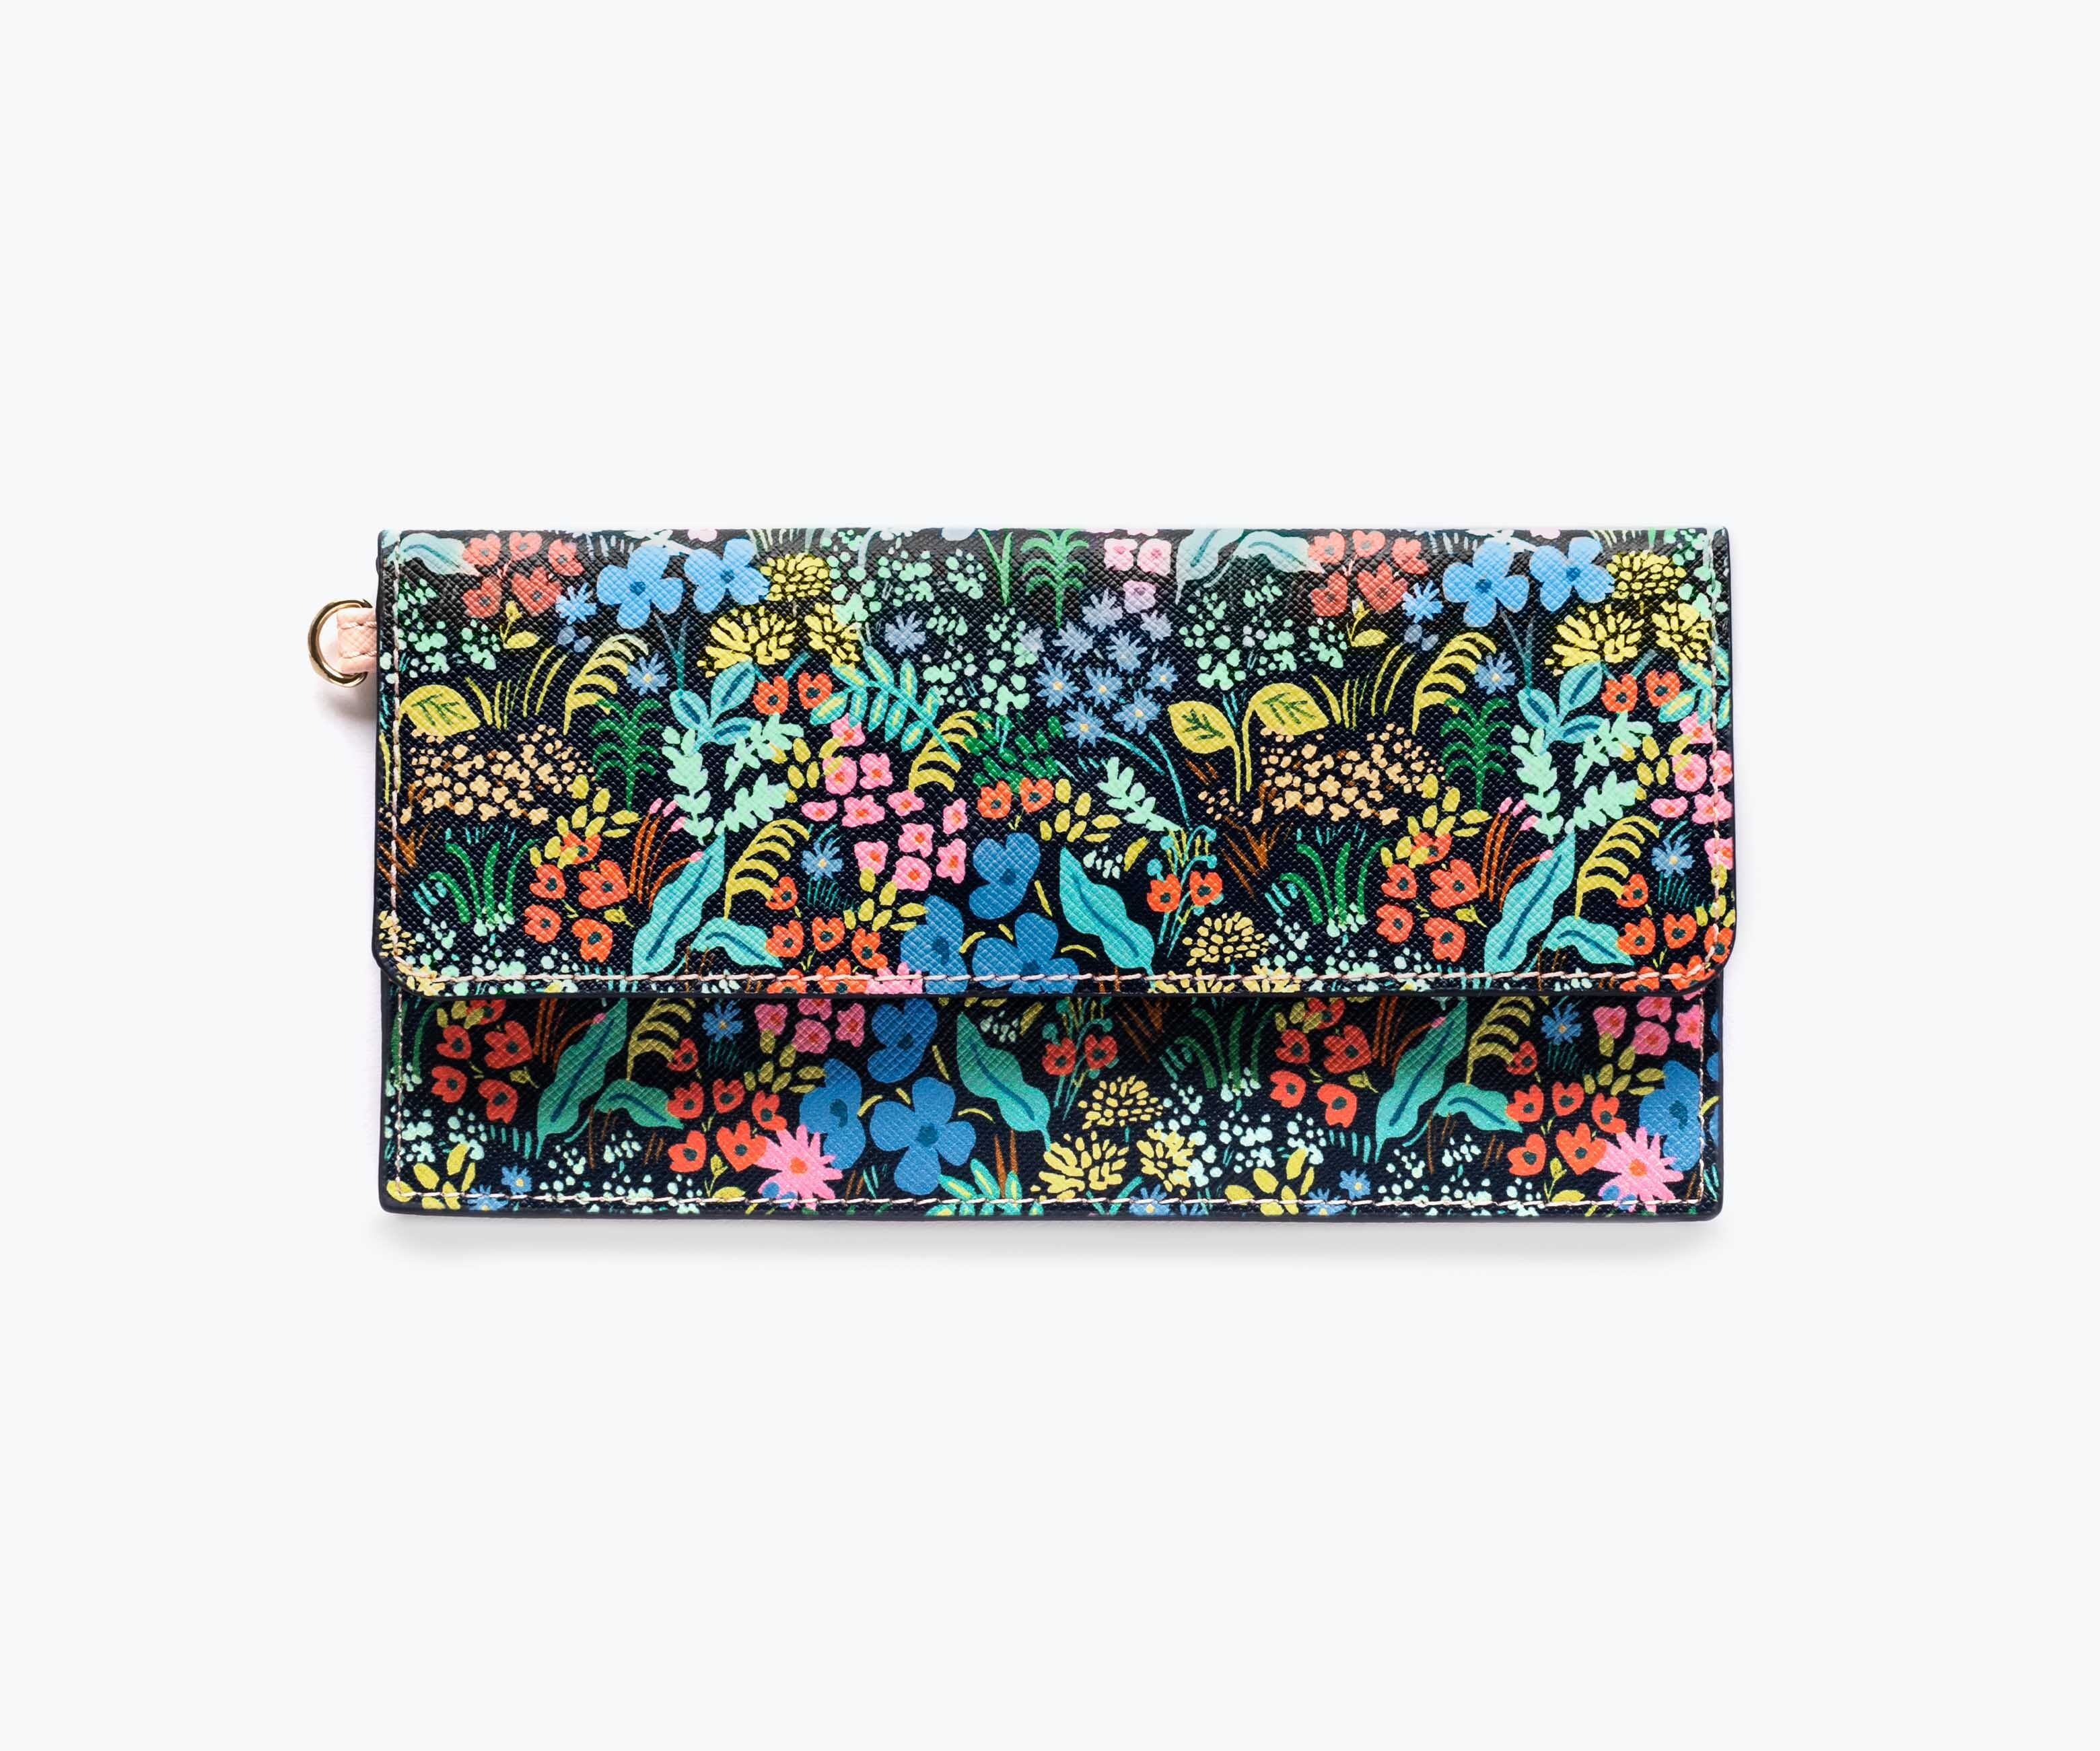 Teachers gift Floral pouch wristlet Rifle paper co Menagerie Tapestry Rifle paper co pouch wristlet Cotton and Steel pouch wristlet